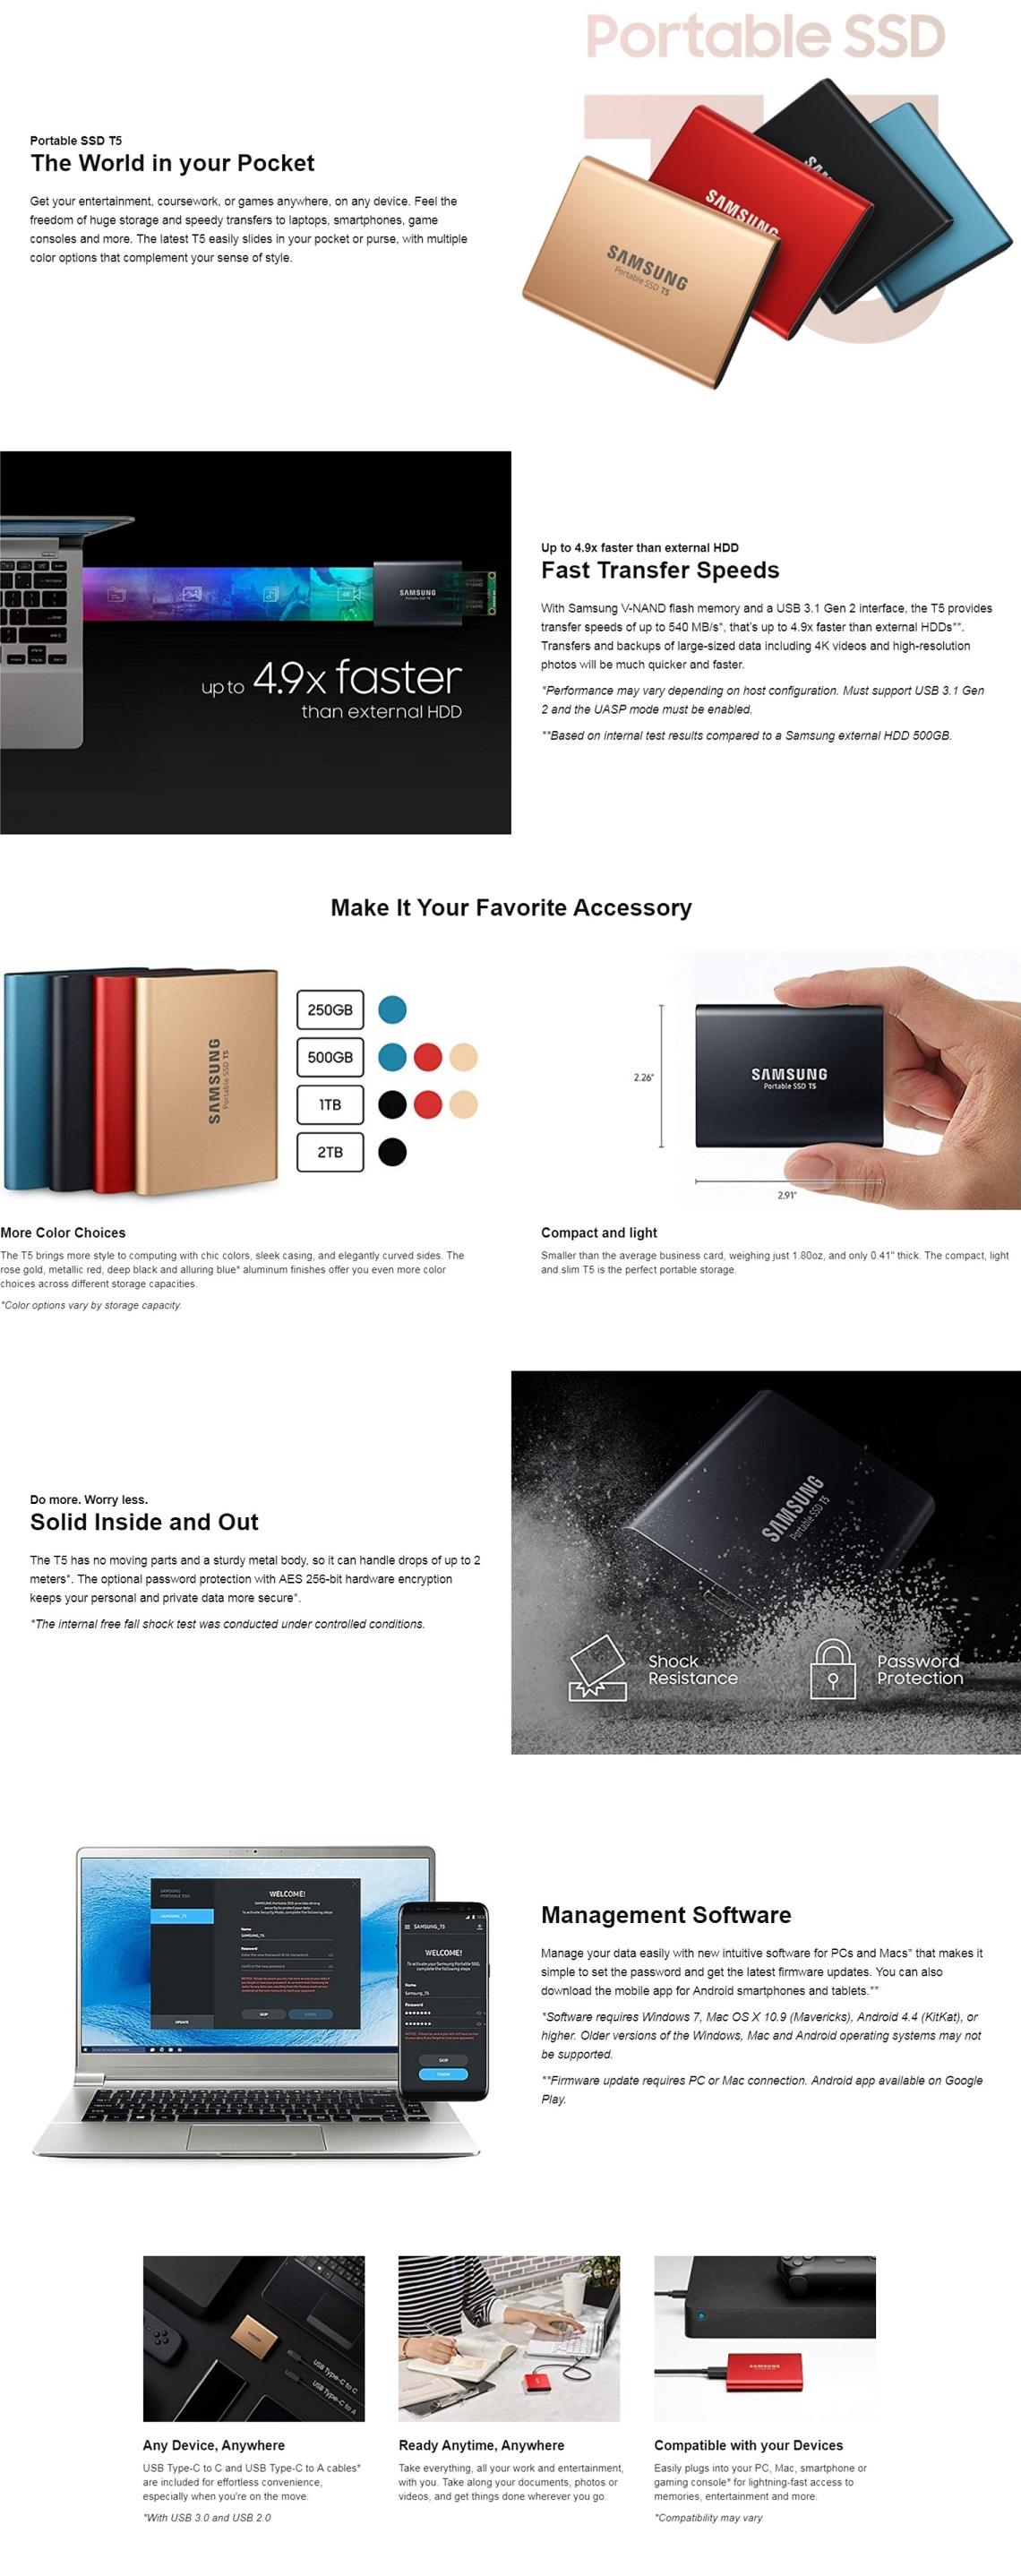 Samsung 500GB T5 Portable External SSD USB3.1 (Gen2) Type-C Shock Resistant Gold